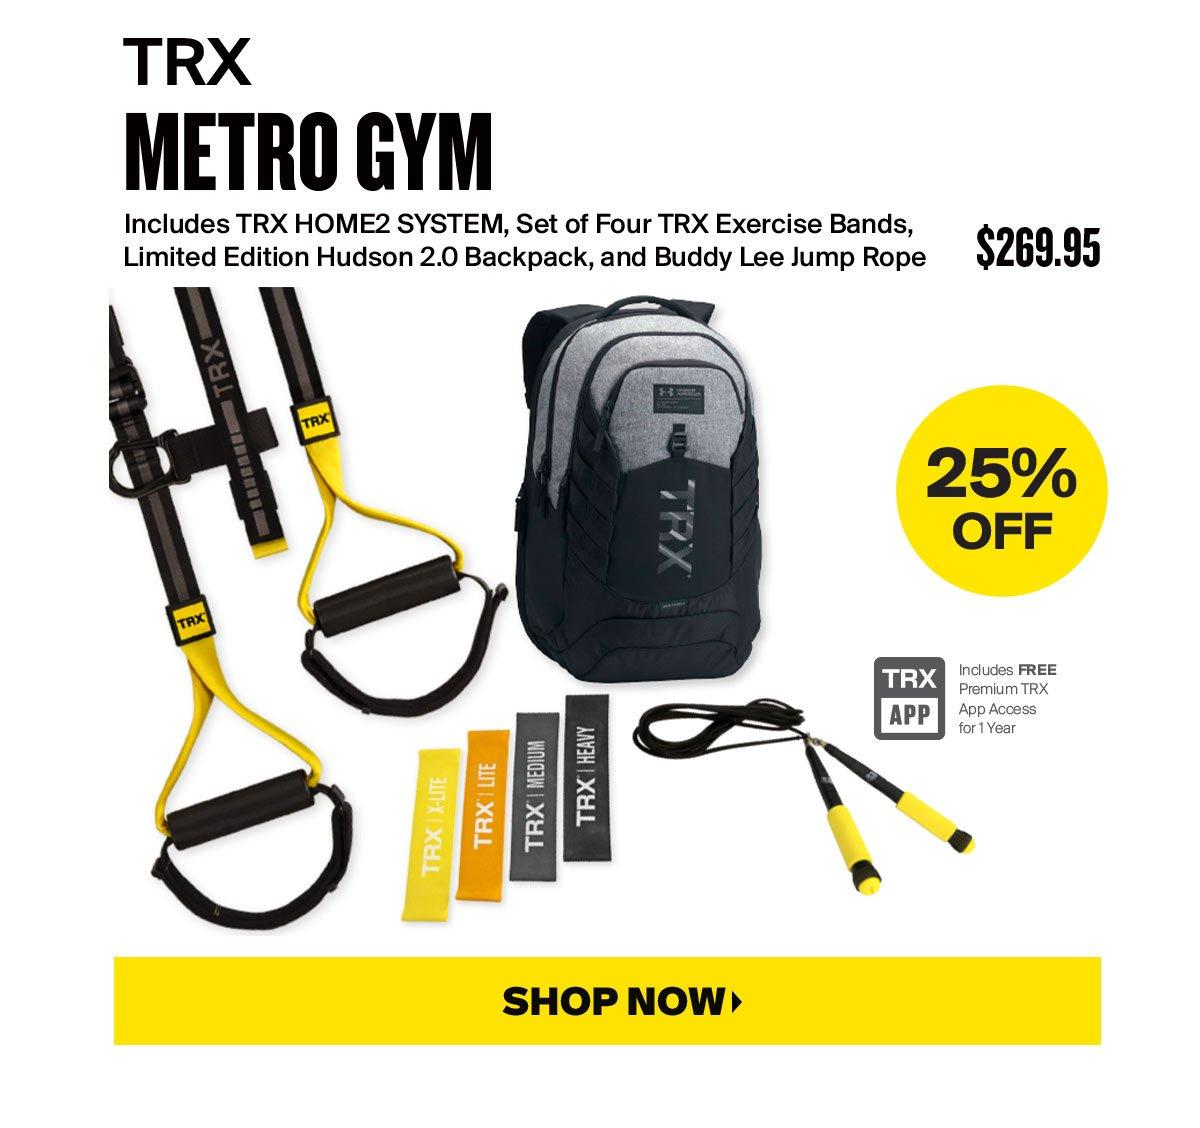 25% OFF TRX METRO GYM | $269.95 | SHOP NOW >